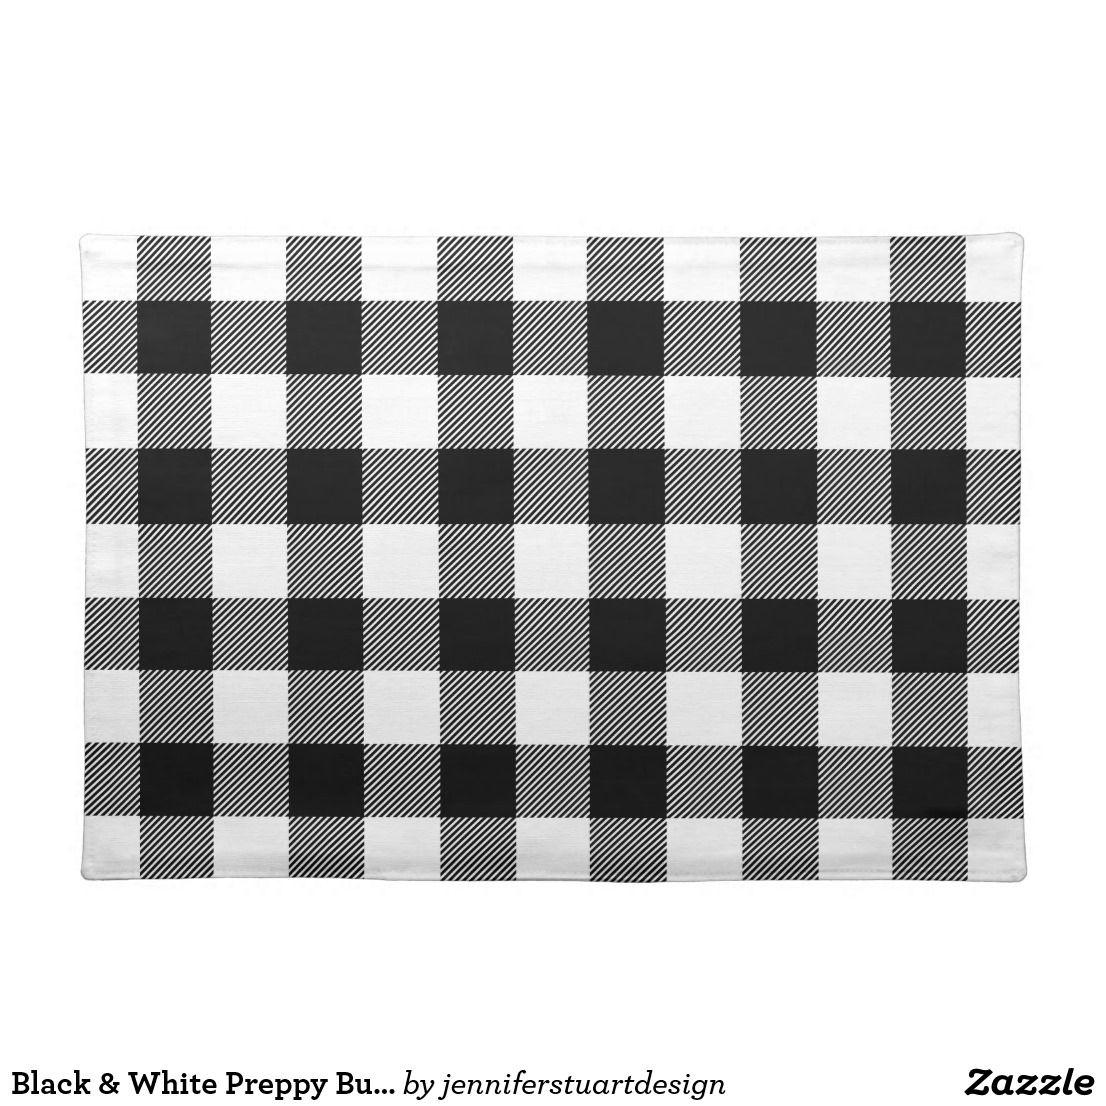 Black White Preppy Buffalo Check Plaid Placemat Zazzle Com Buffalo Check Plaid Placemats Kitchen Crafts Diy